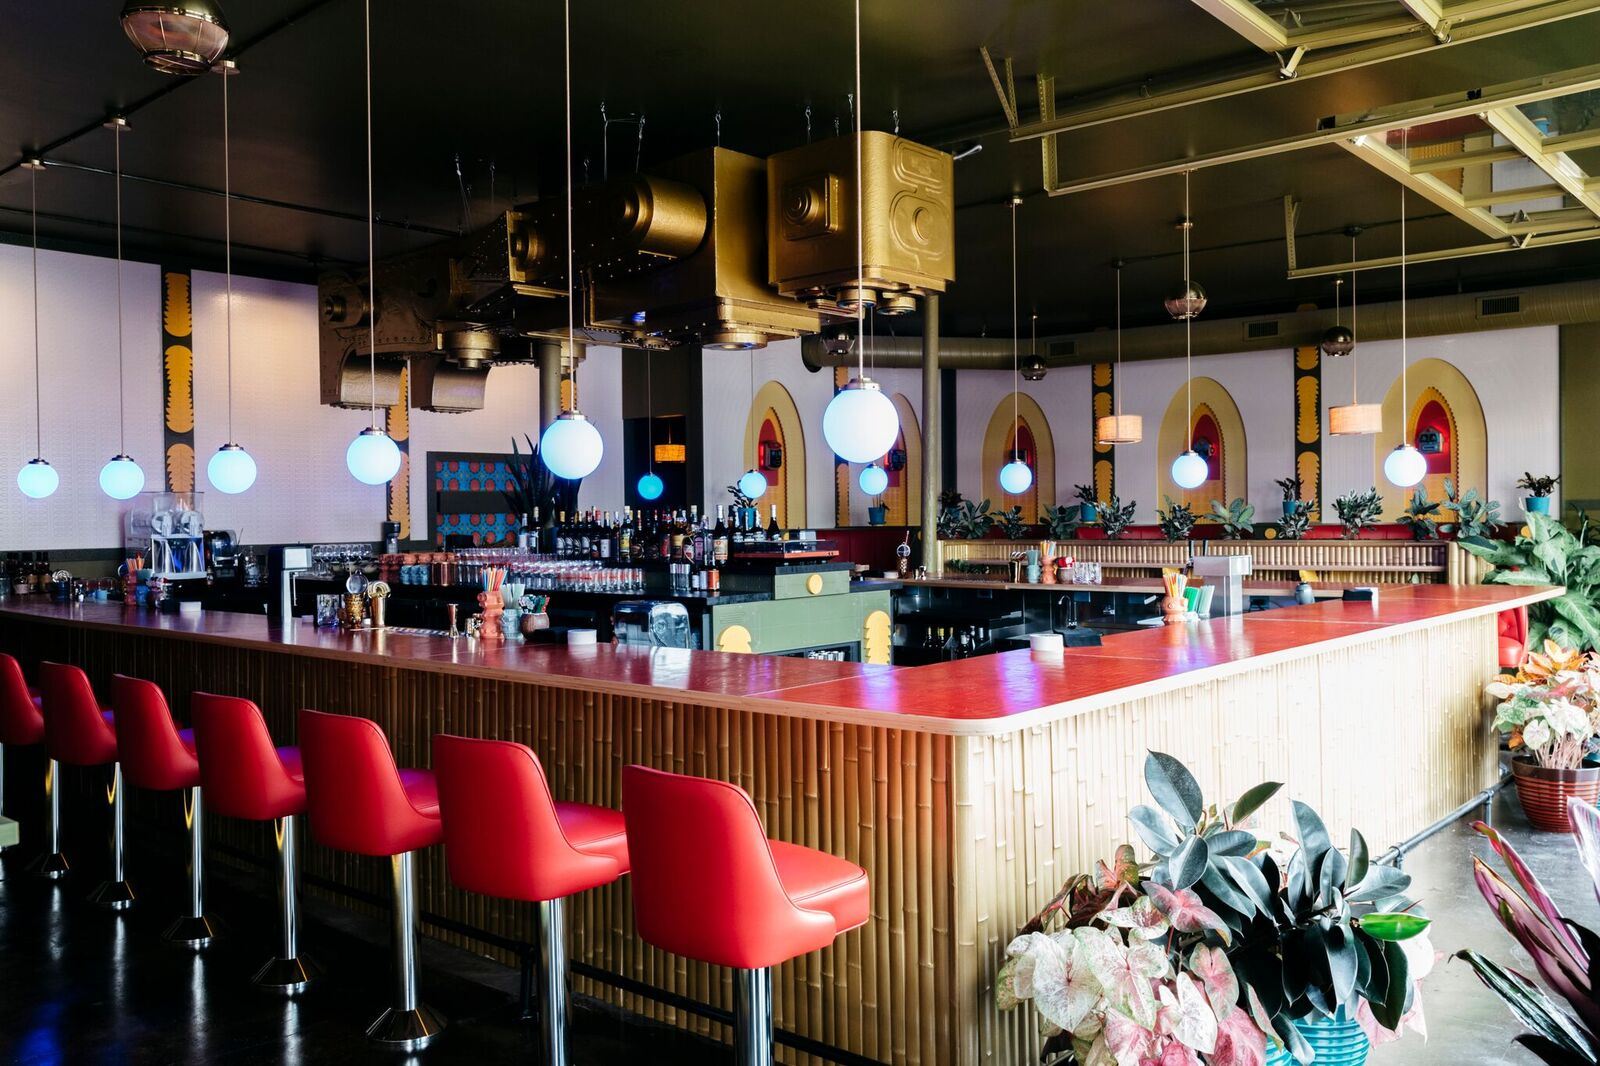 Take a First Look Inside Chopper, East Nashville's Robot-Friendly Tiki Bar